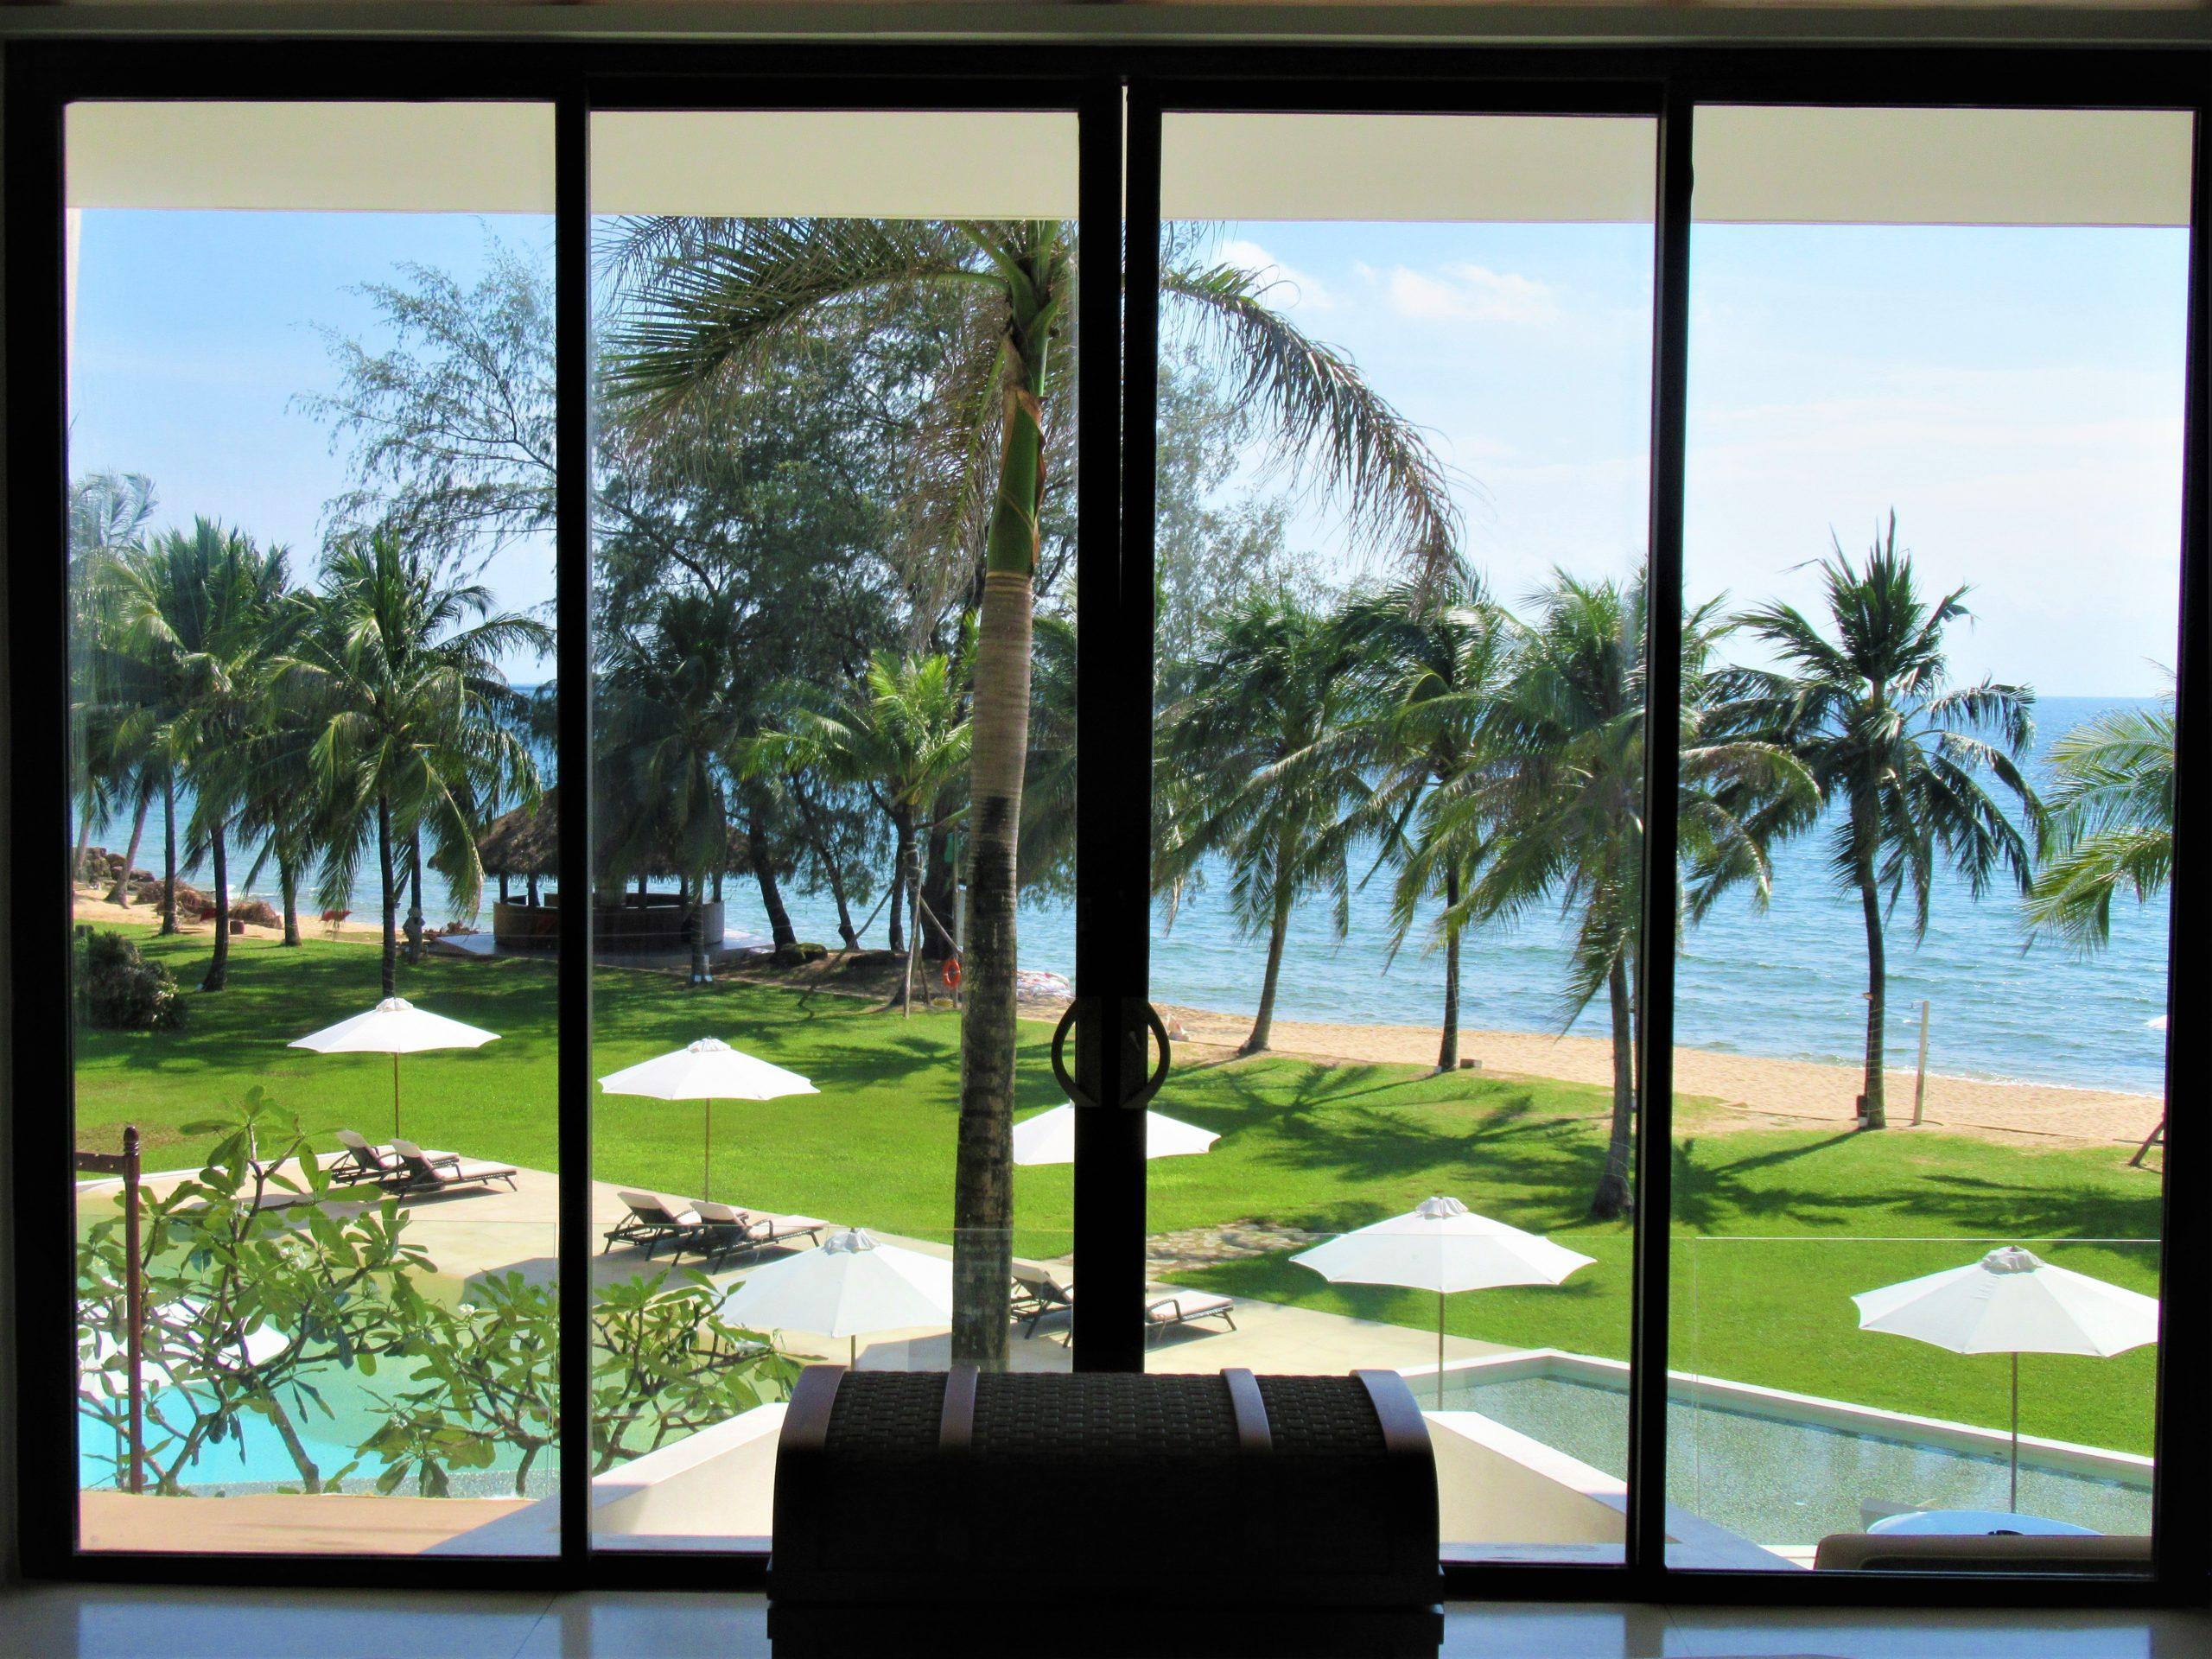 Guest room in main building, The Shells Resort, Phu Quoc Island, Vietnam